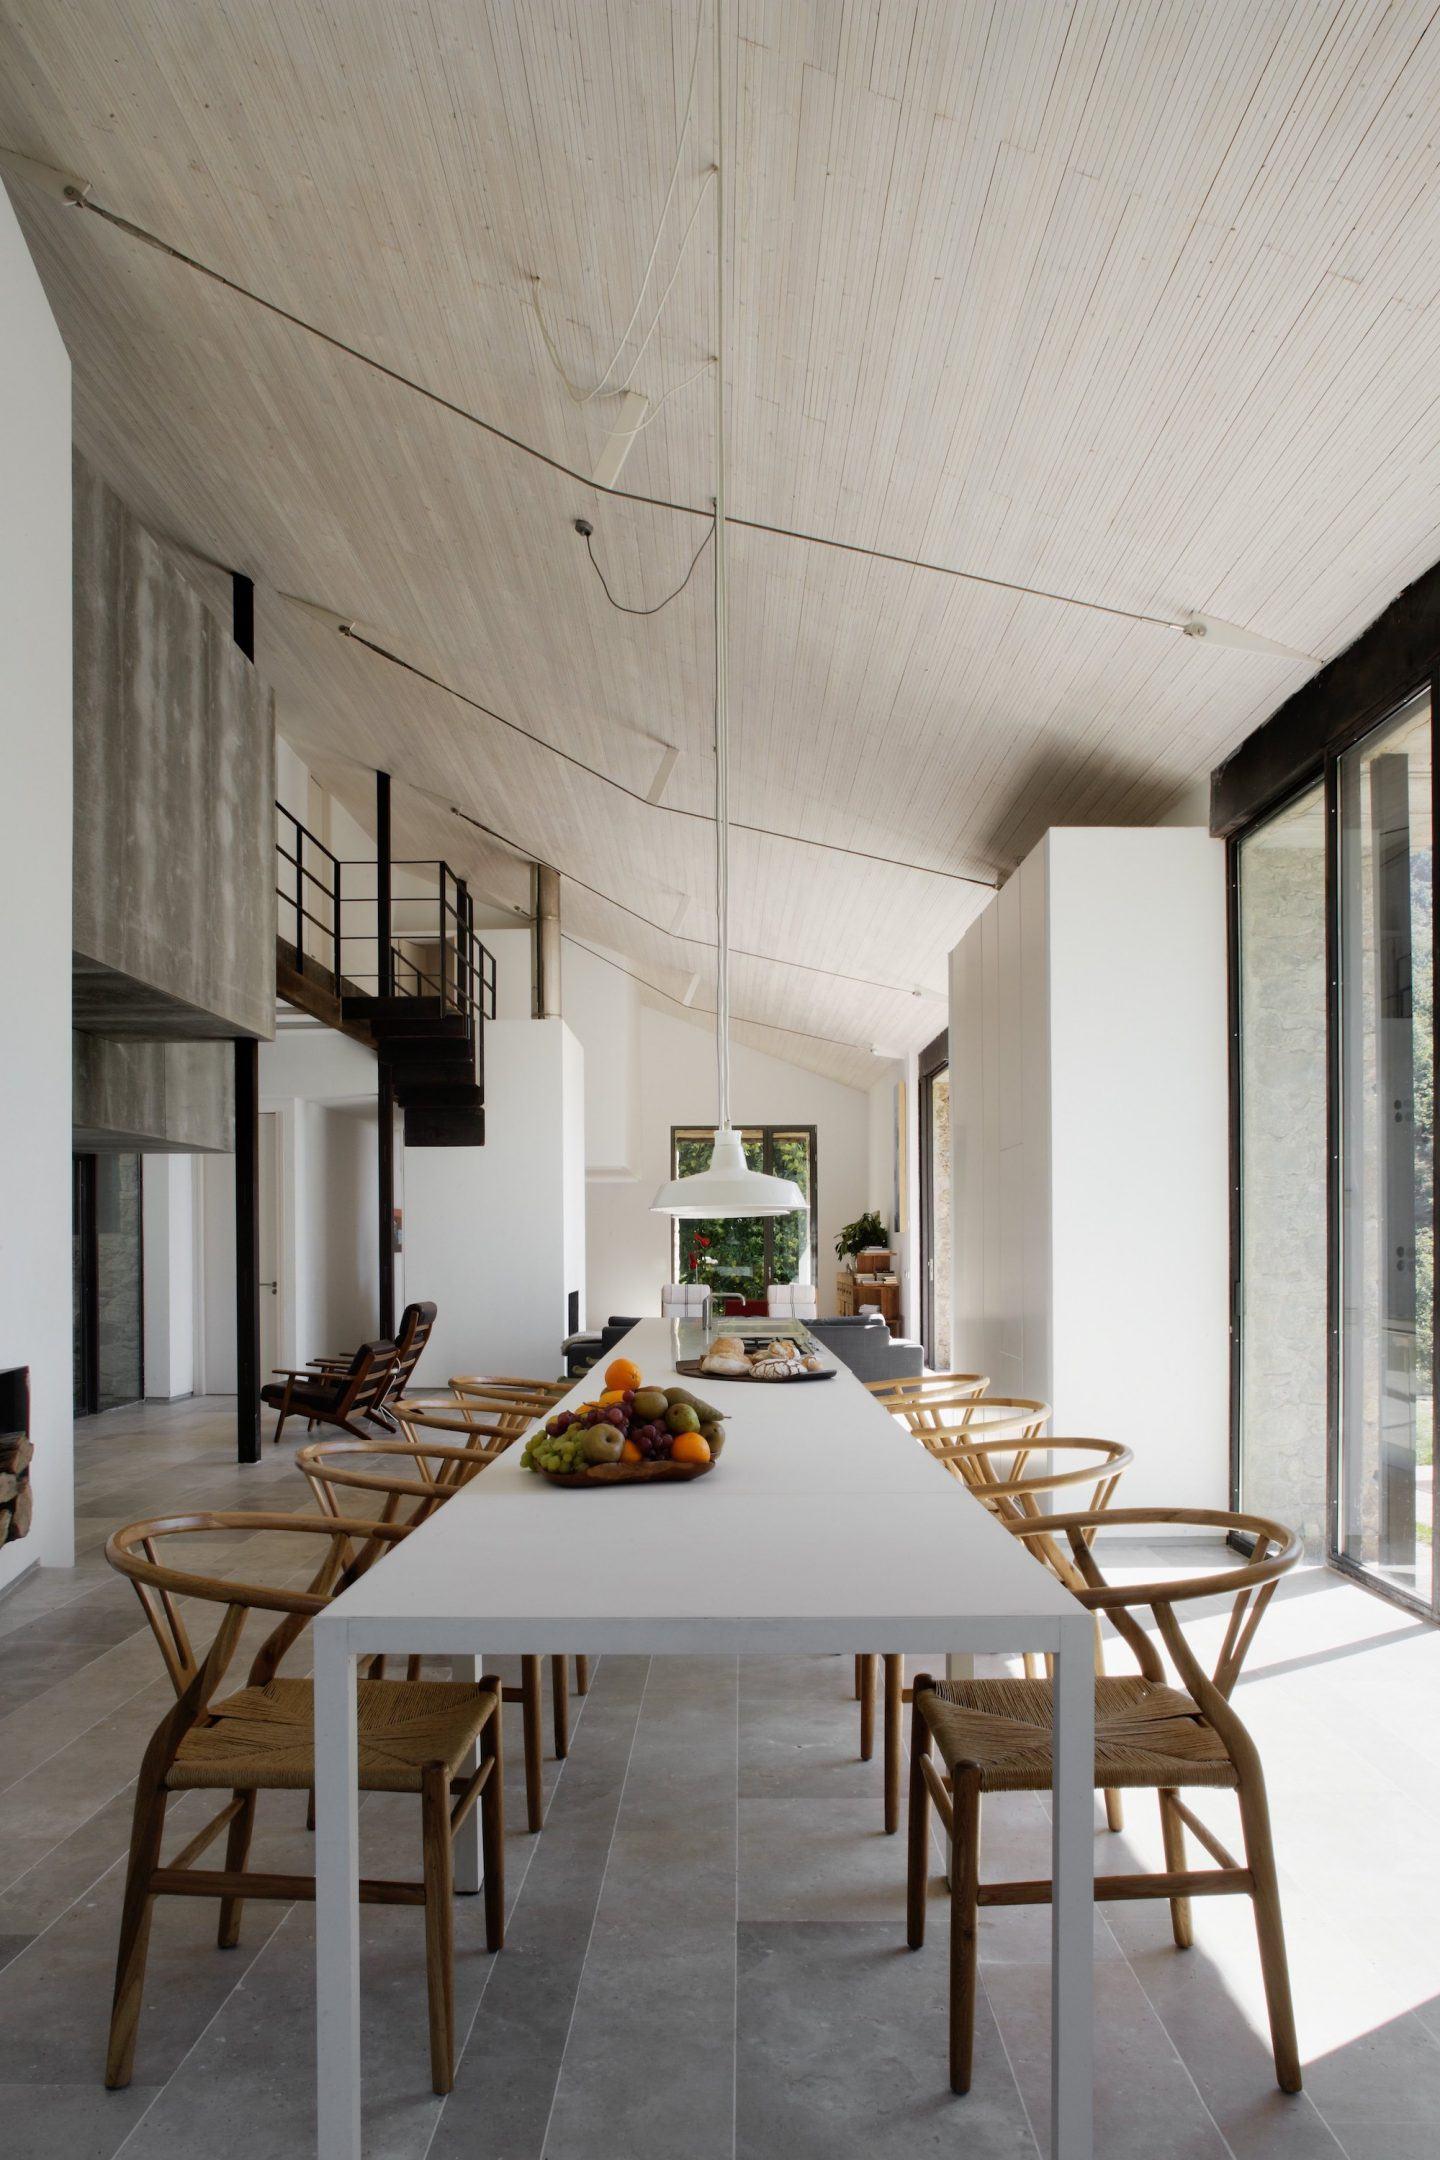 IGNANT-Travel-Abaton-Arquitectura-Finca-Extremadura-011